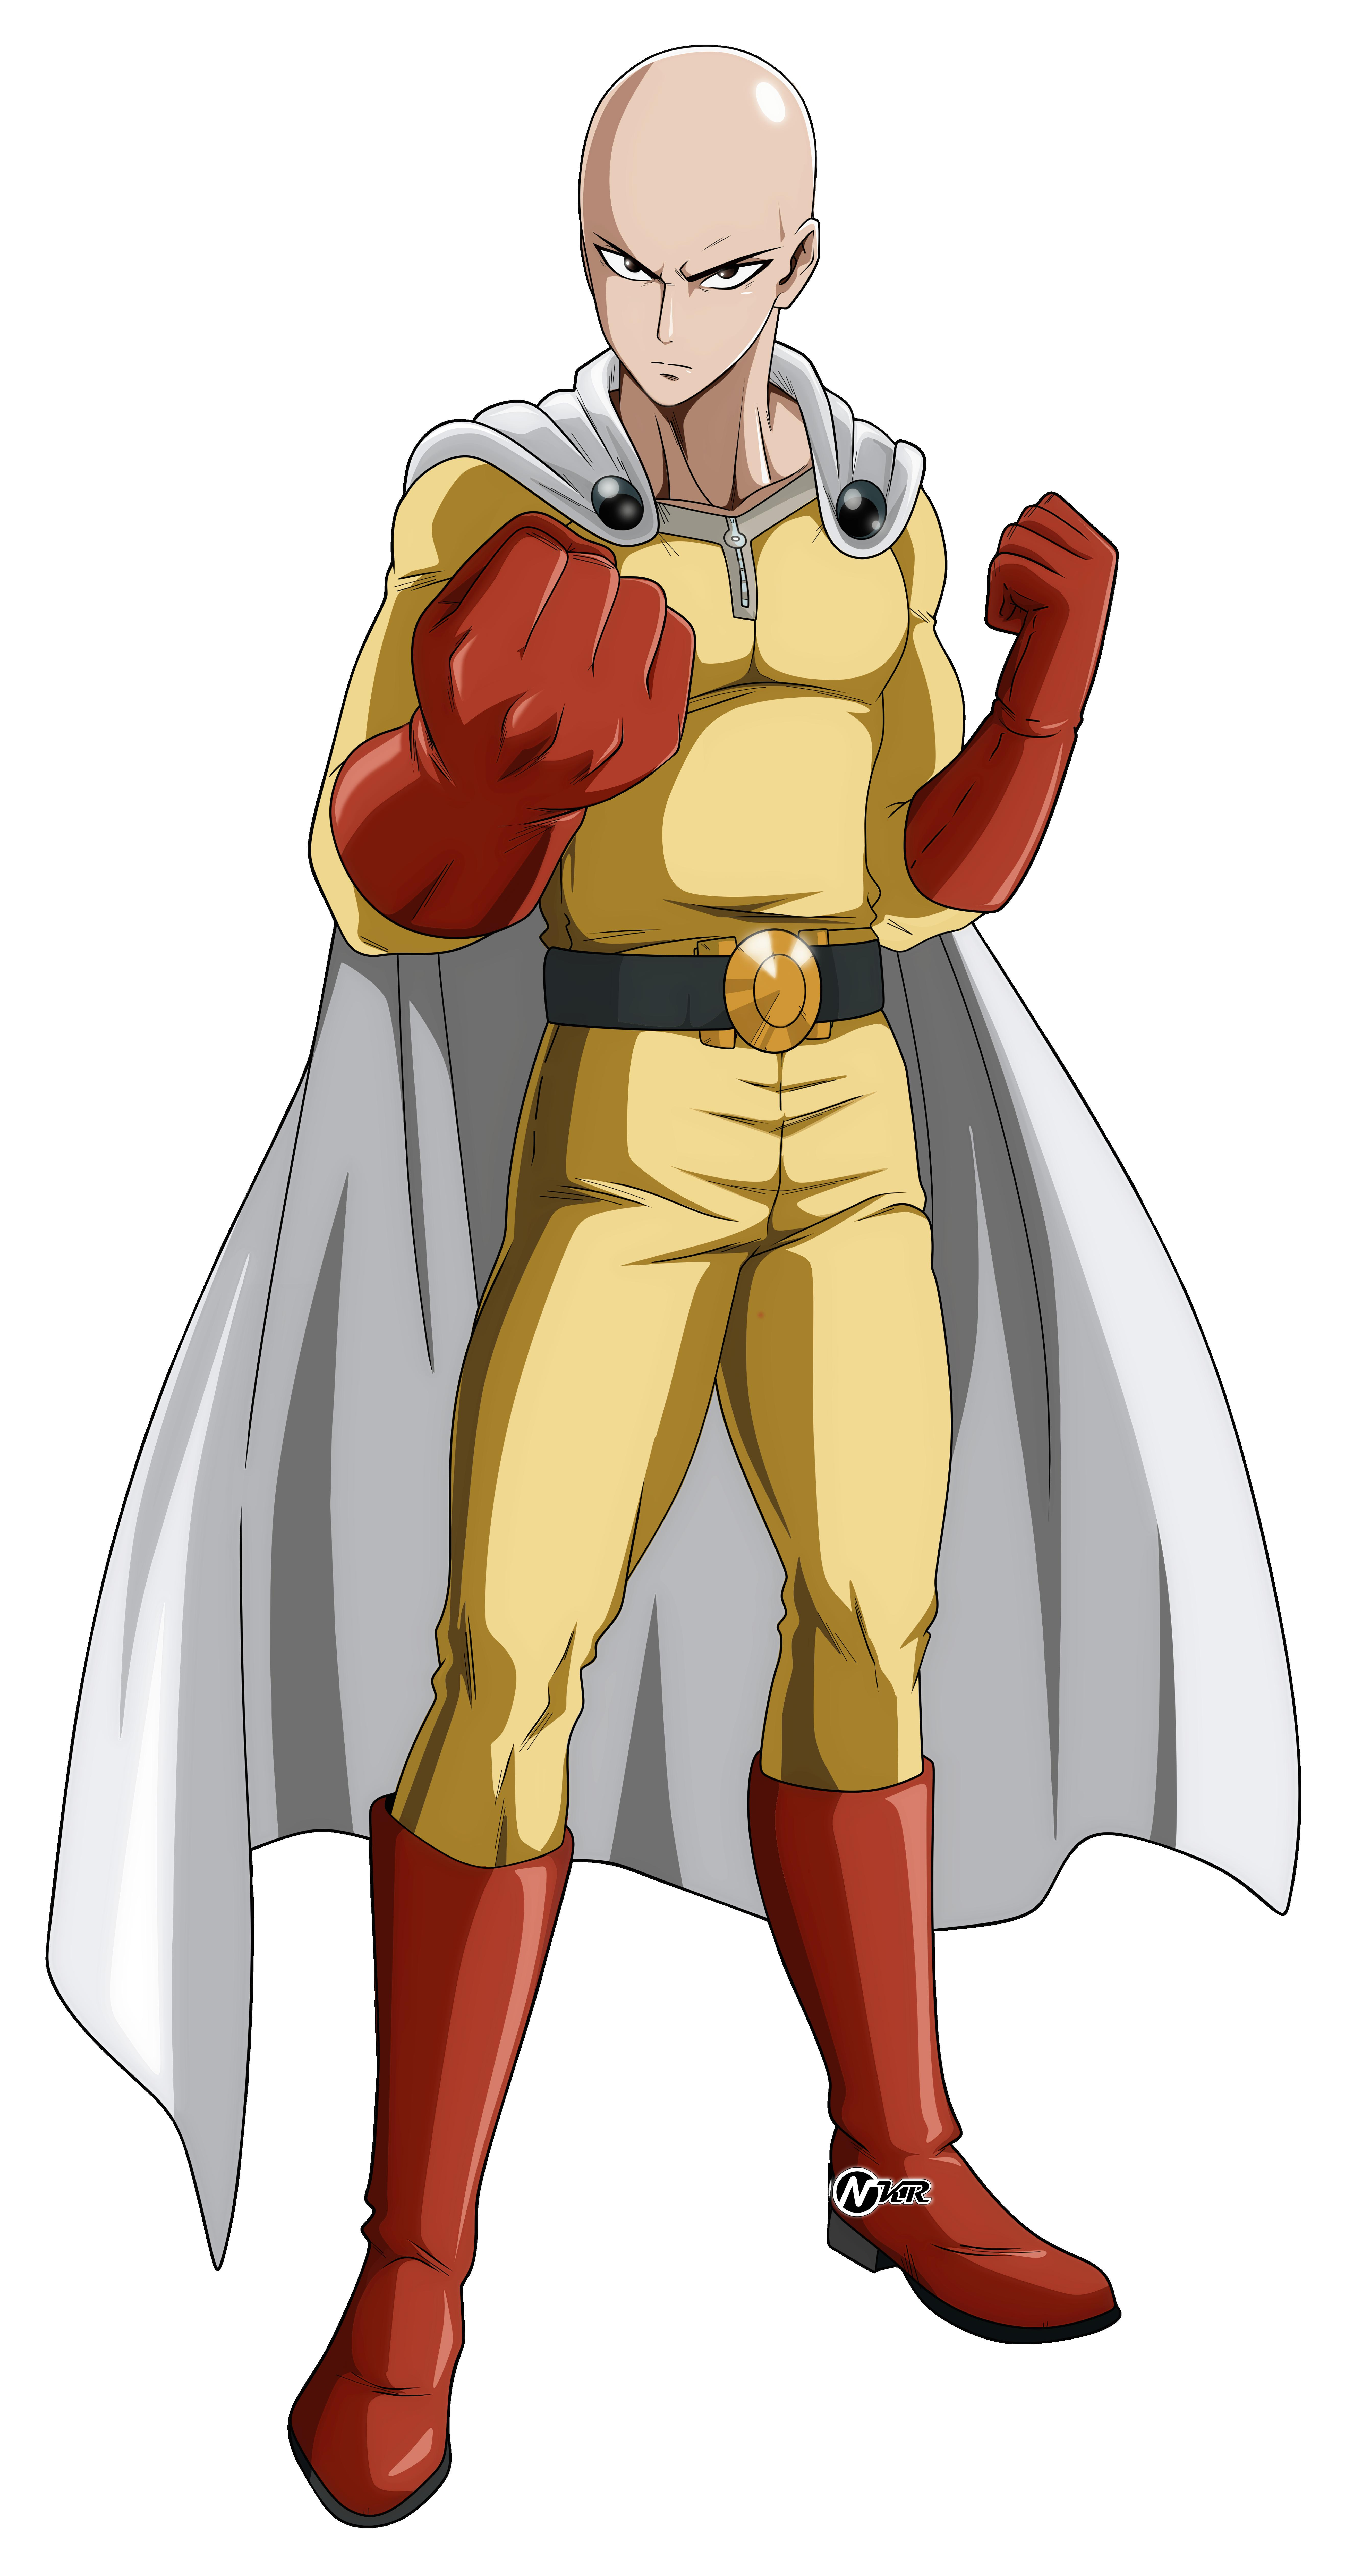 Saitama By Naironkr On Deviantart One Punch Man Funny One Punch Man Anime One Punch Man